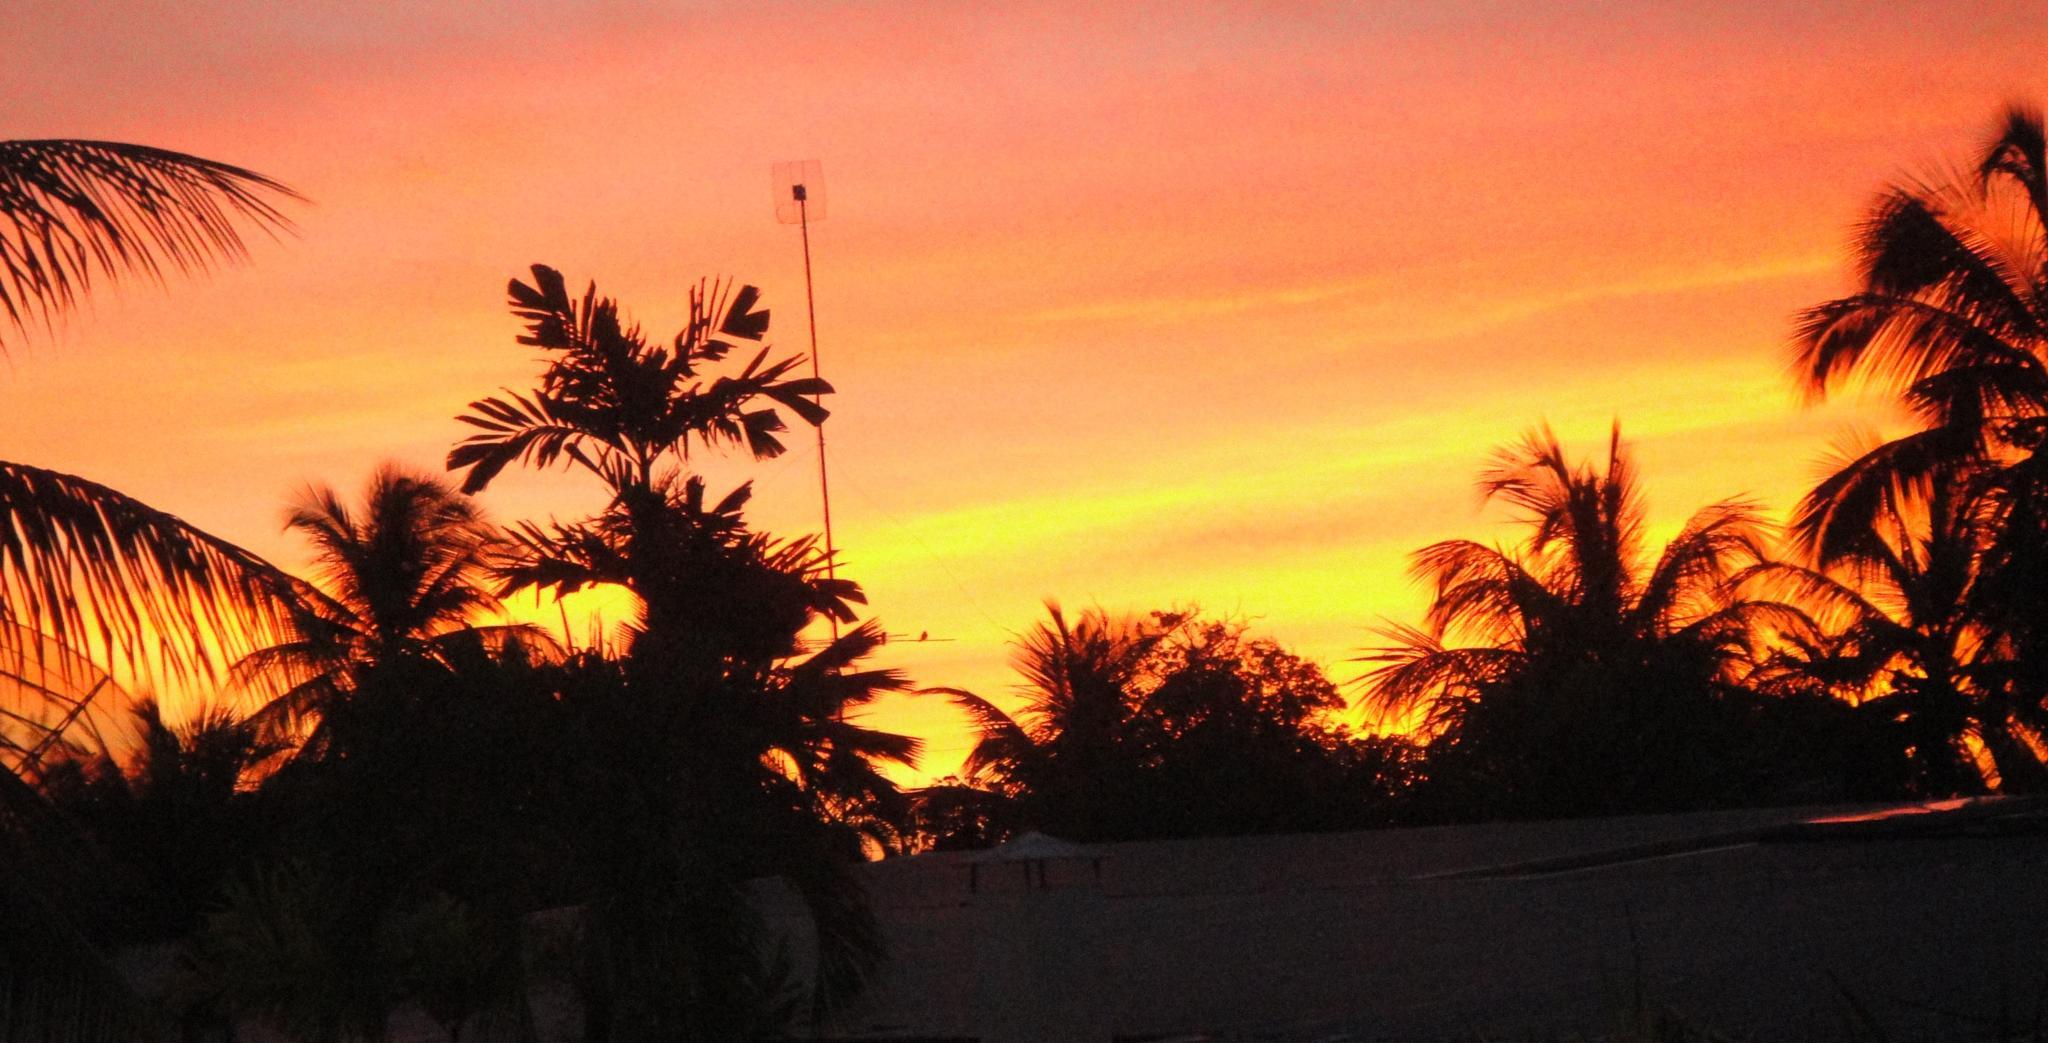 Bajan Sunset by MissXavierBurgess